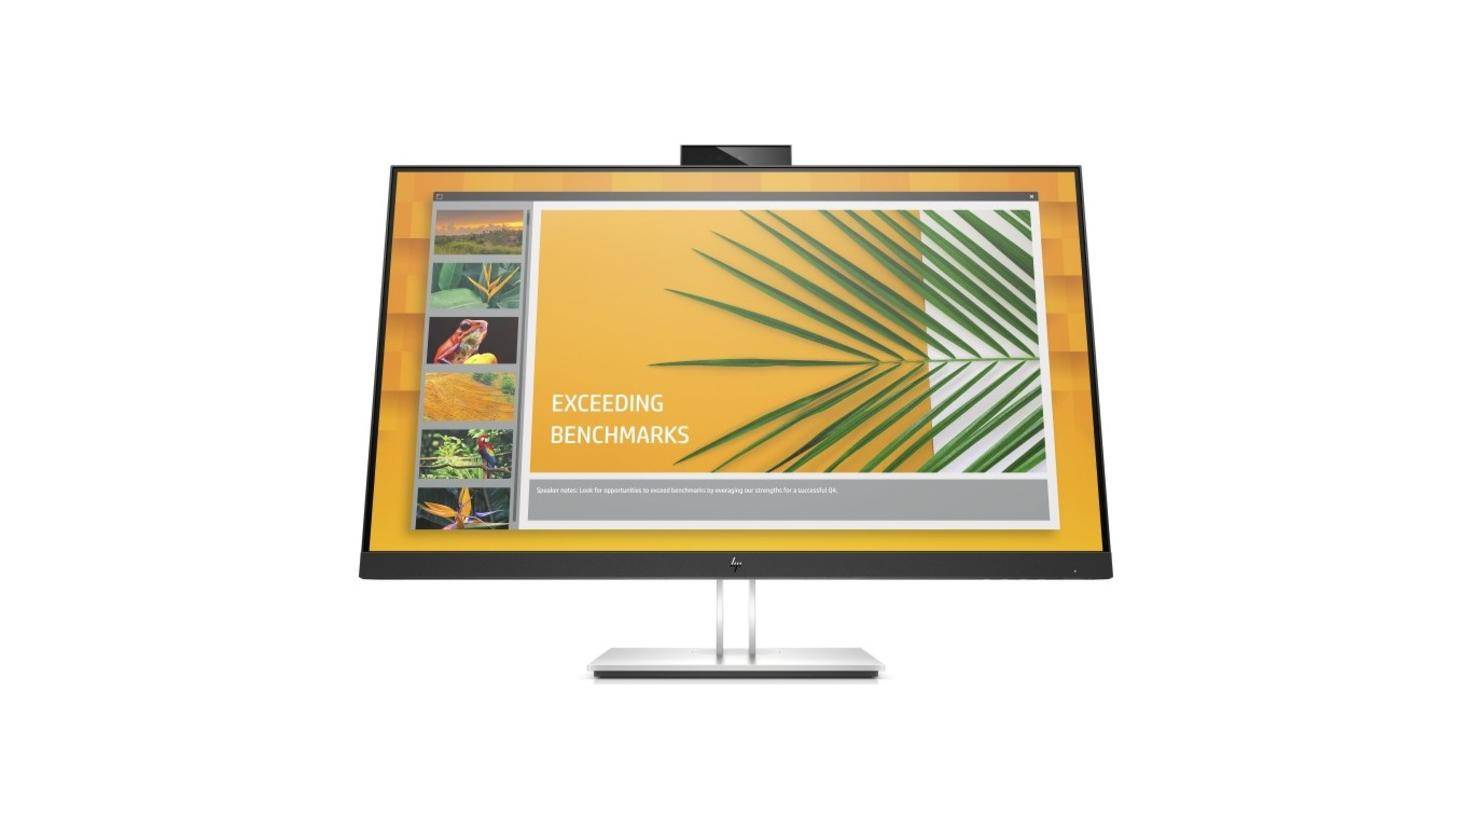 hp-elitedisplay-e27d-g4-monitor